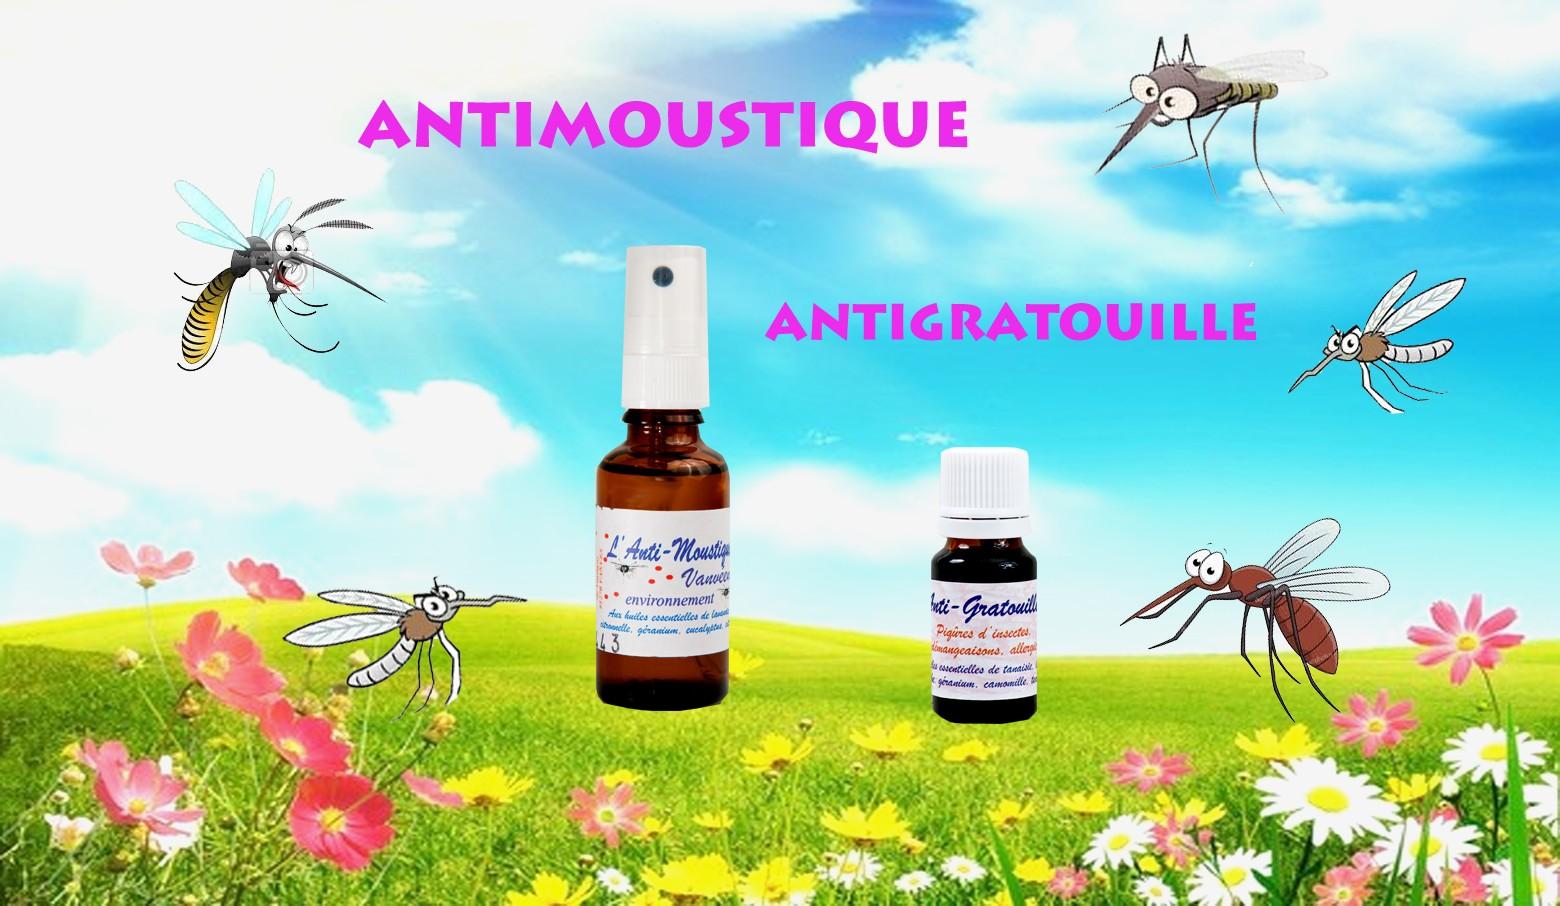 Anti-moustique Antigratouille